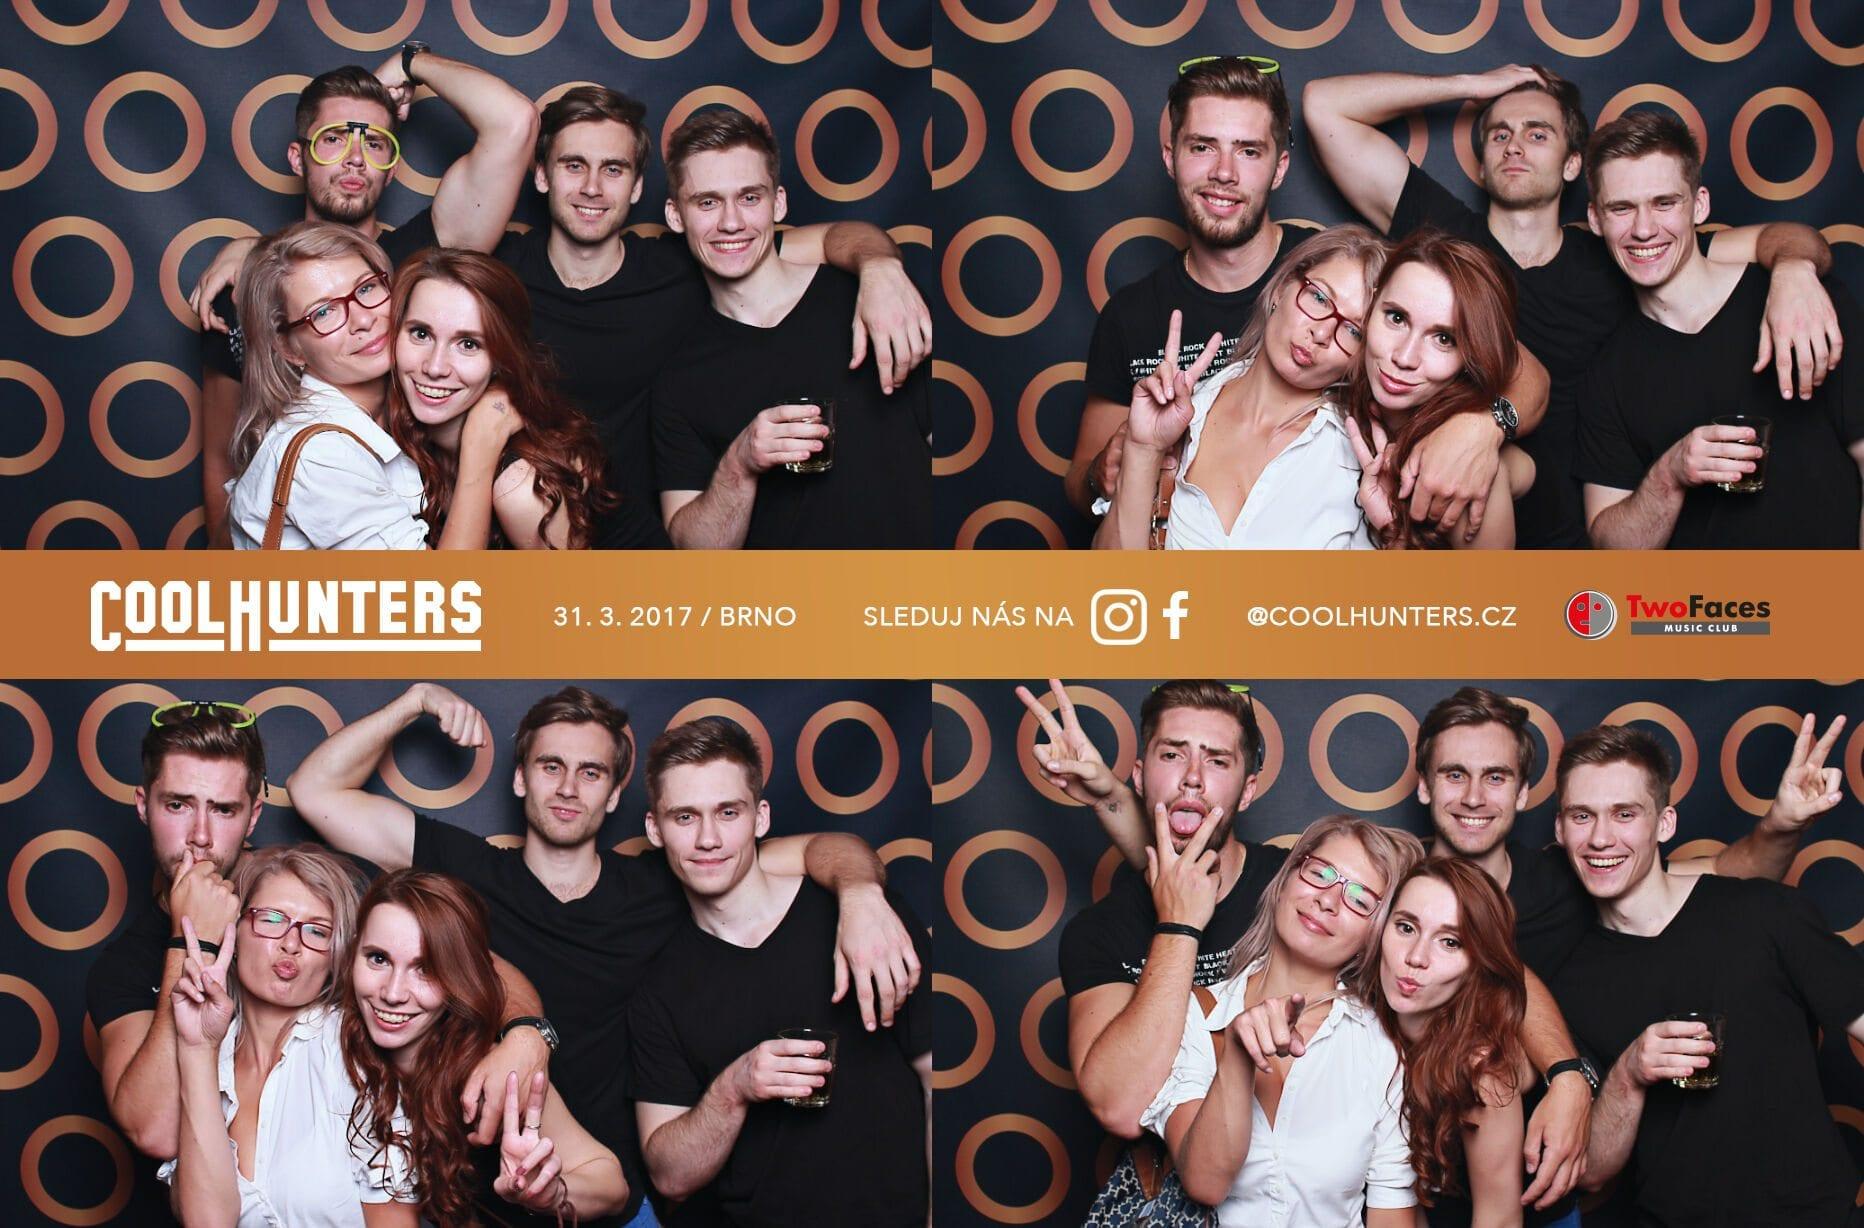 fotokoutek-coolhunters-31-3-2017-231732